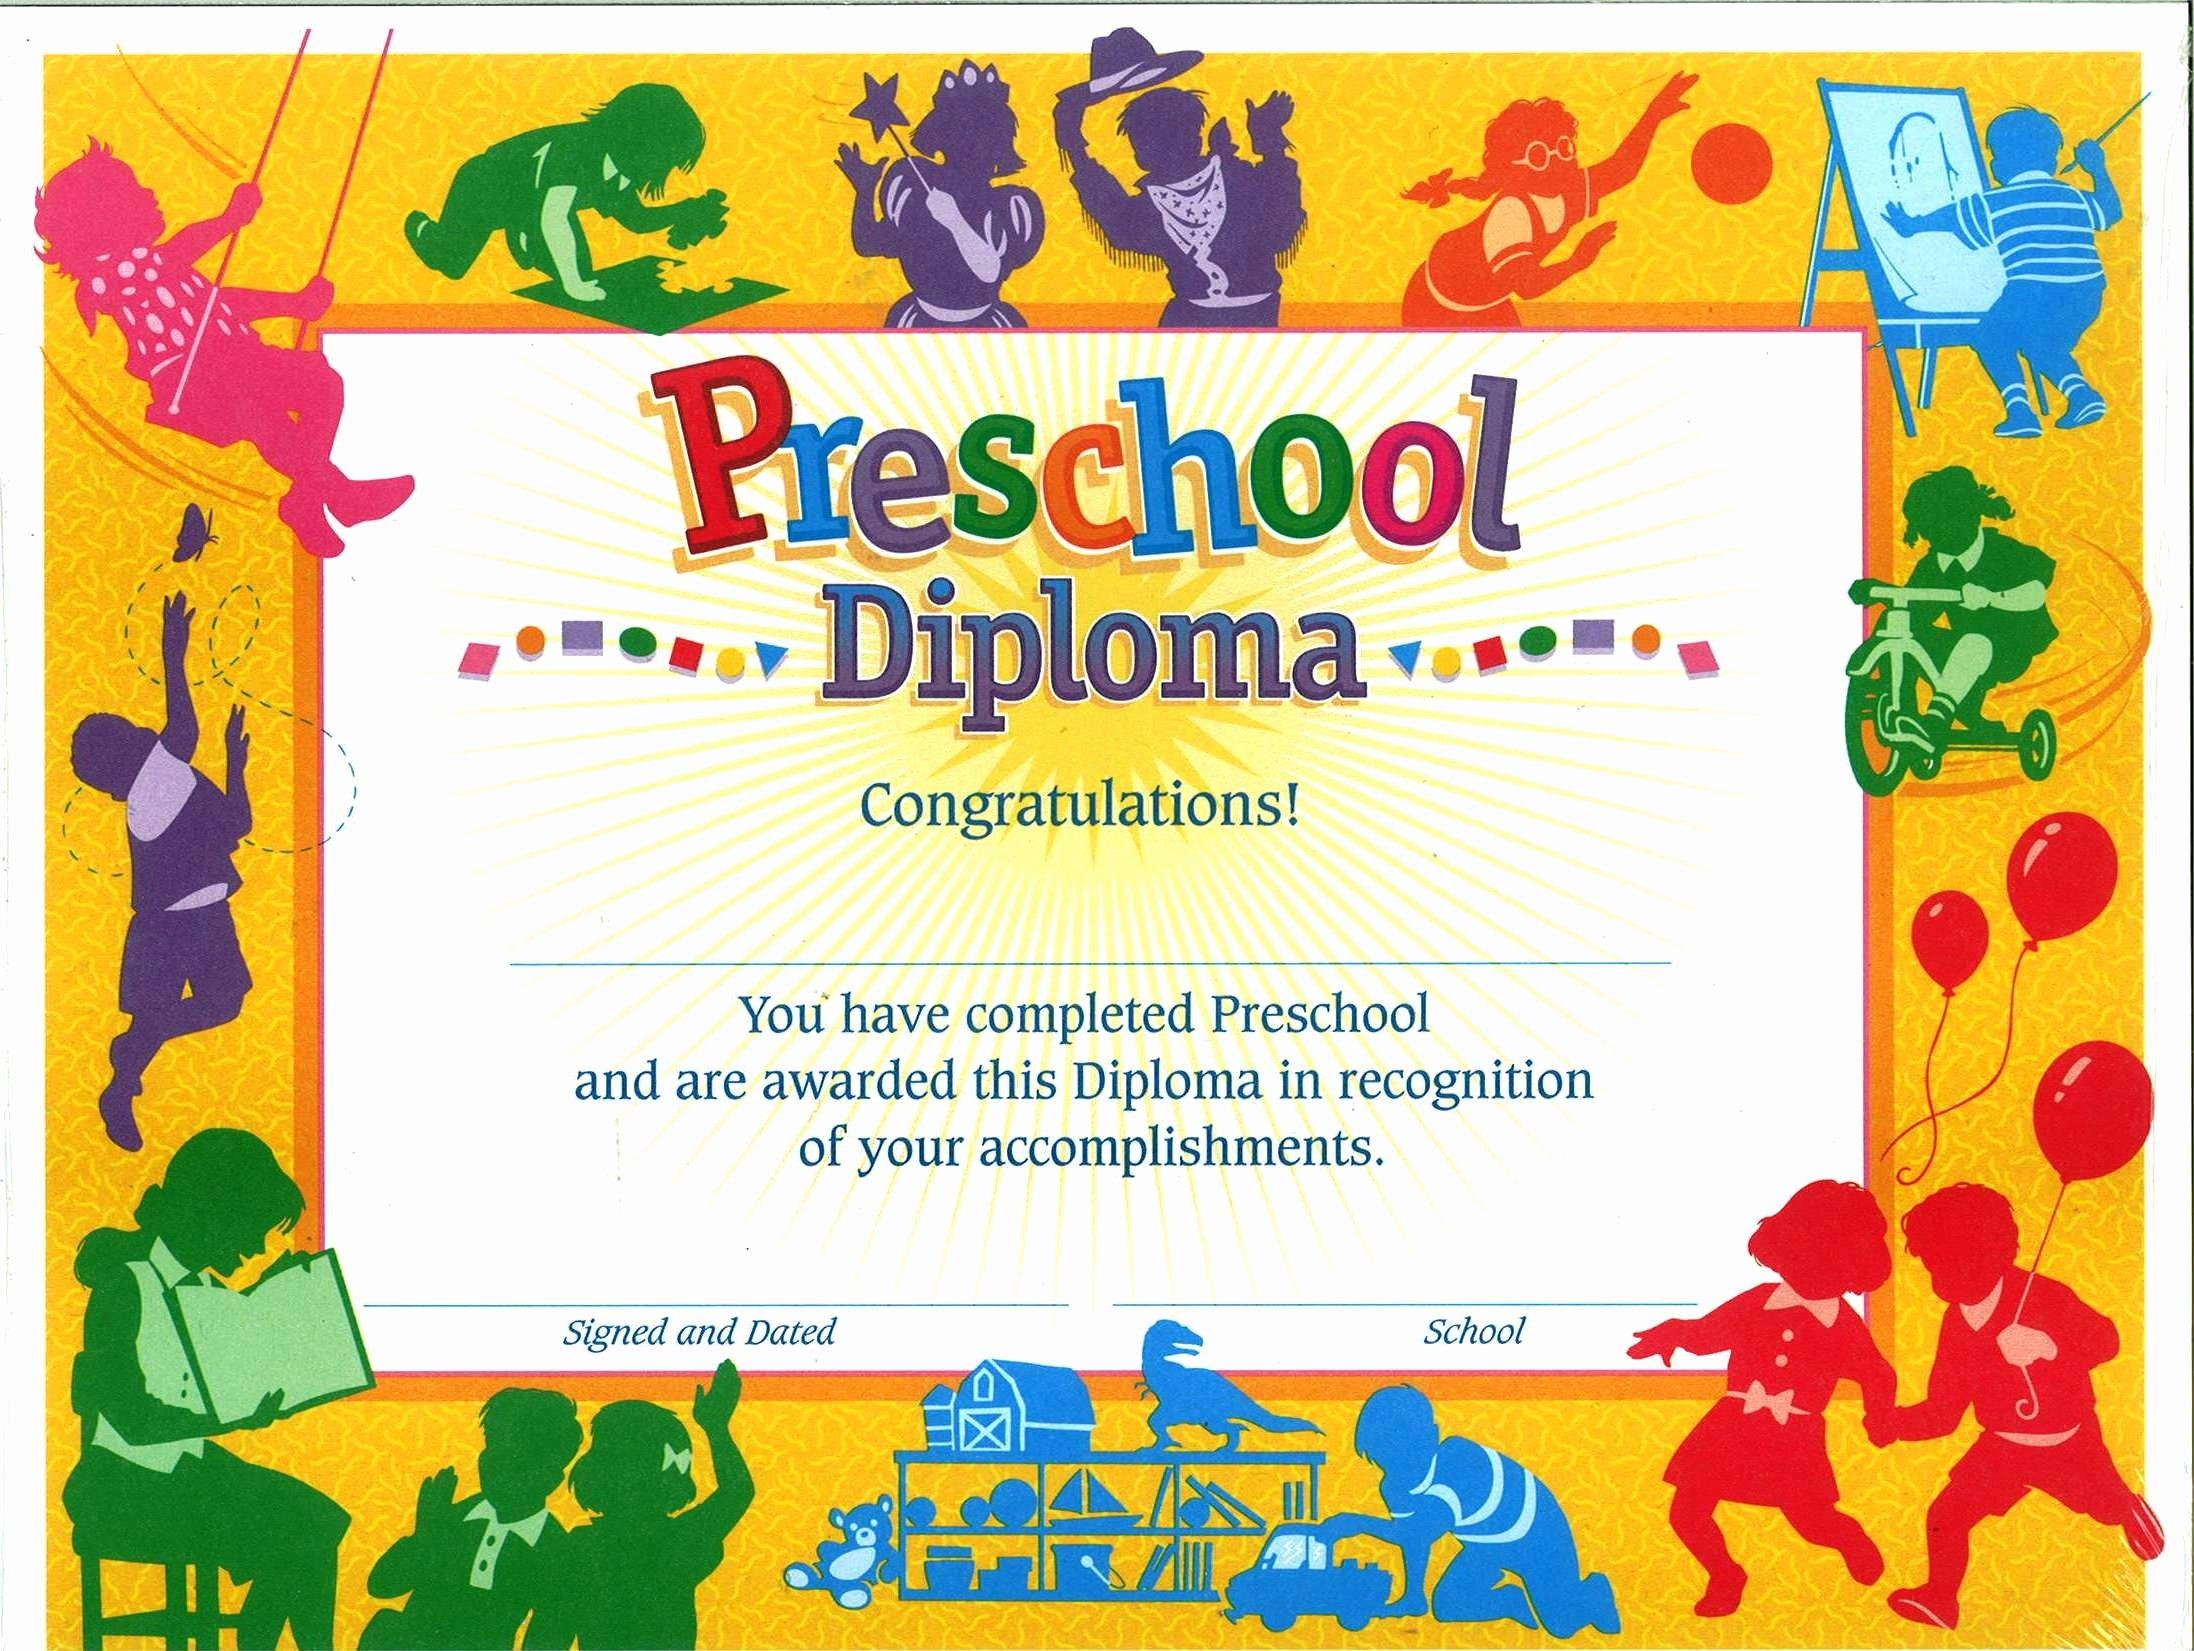 Preschool Certificate Templates Free Fresh 11 Preschool Certificate Templates Pdf